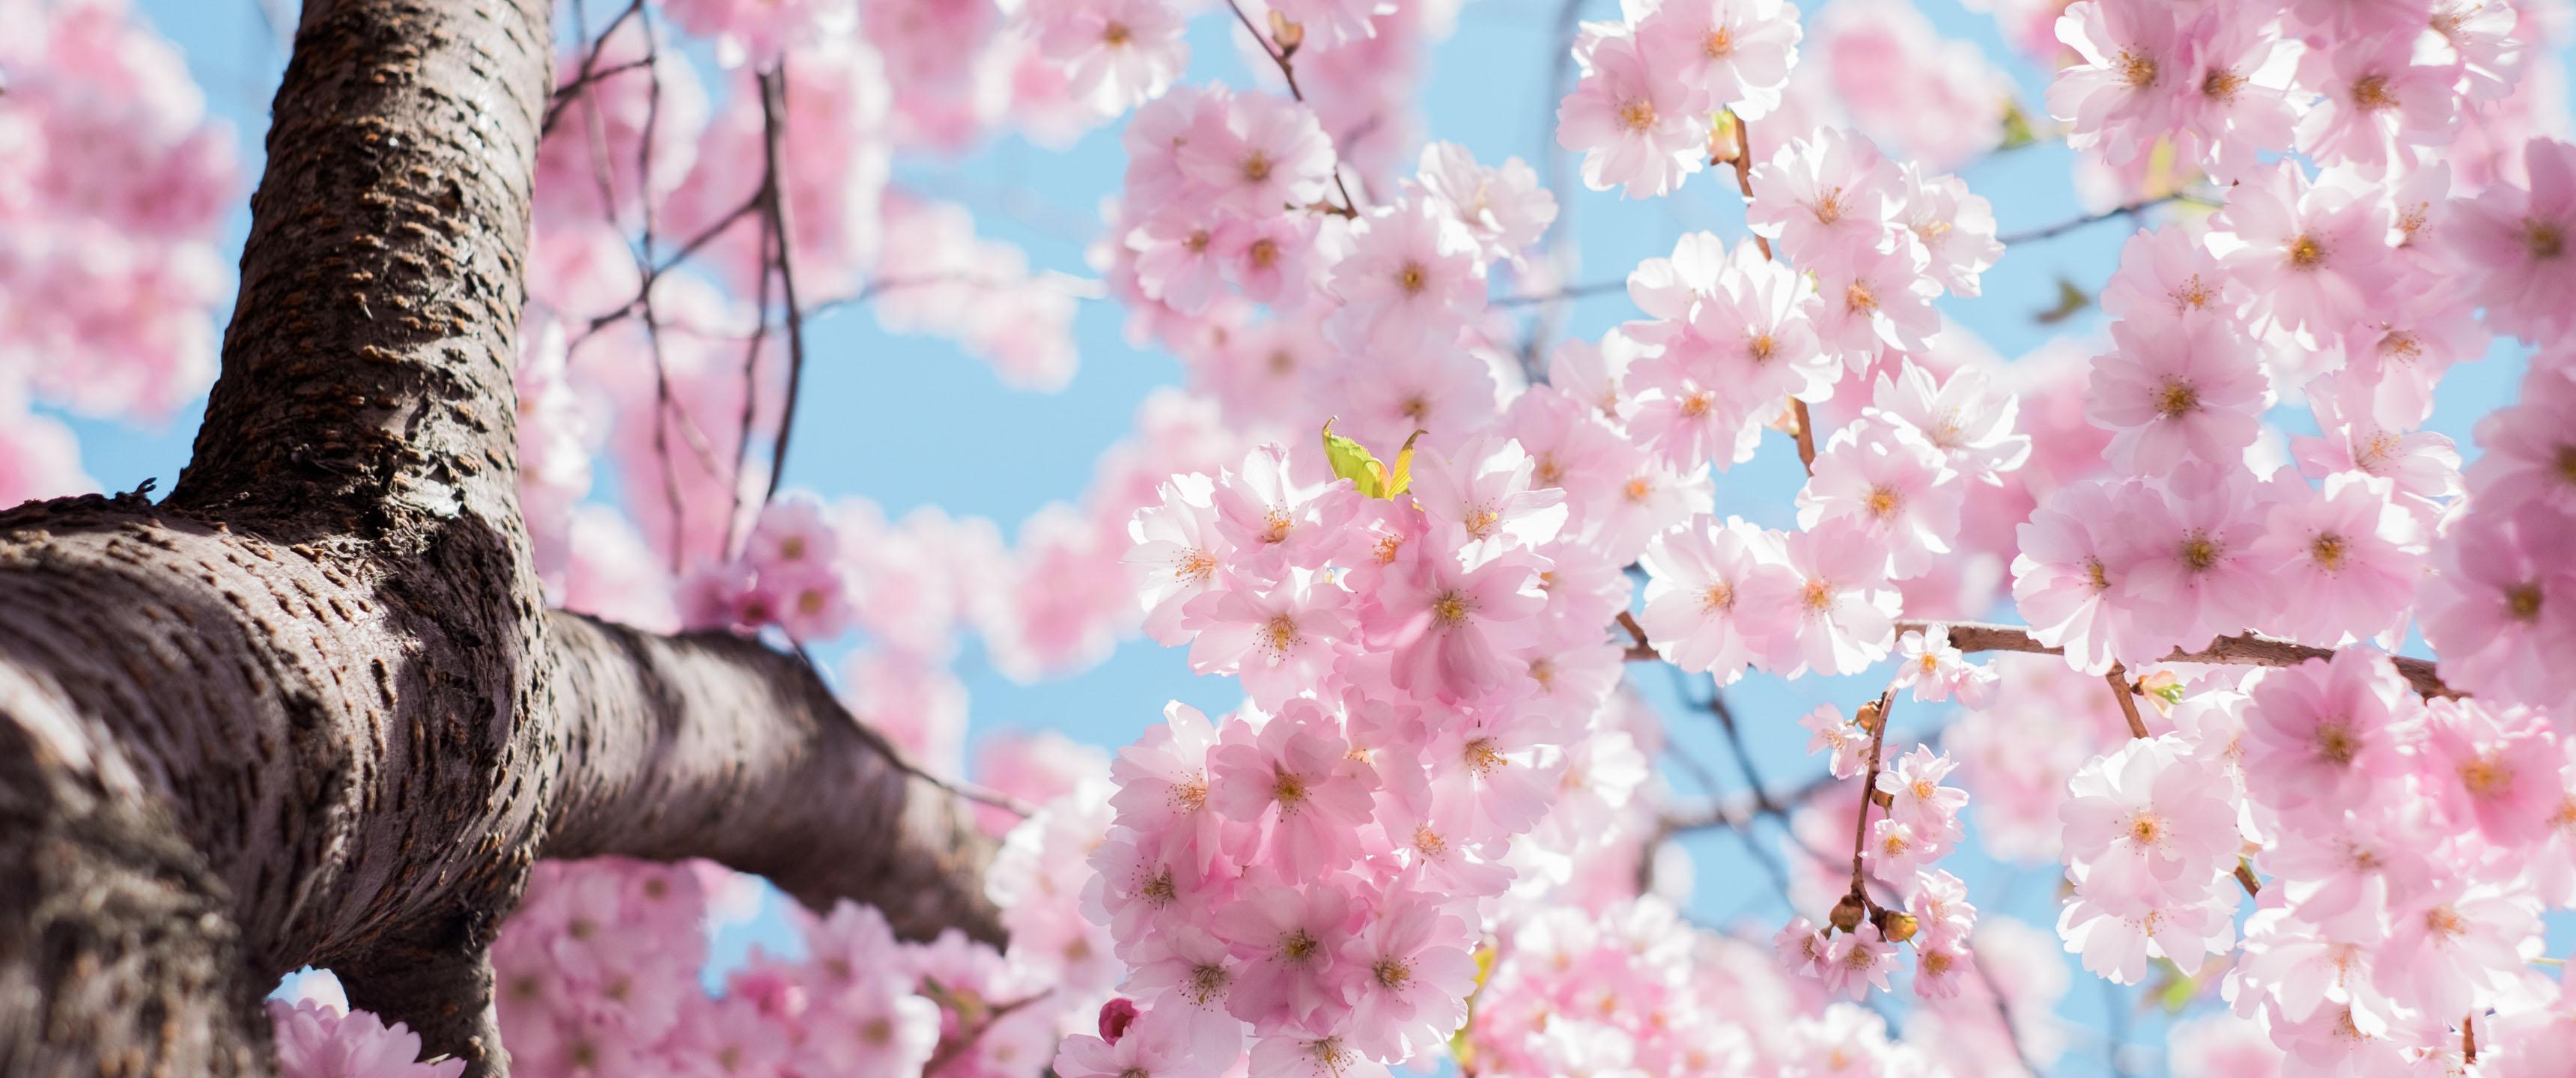 Cherry Blossom Wallpaper Hd Cherry Blossom Season 21 9 Wallpaper Ultrawide Monitor